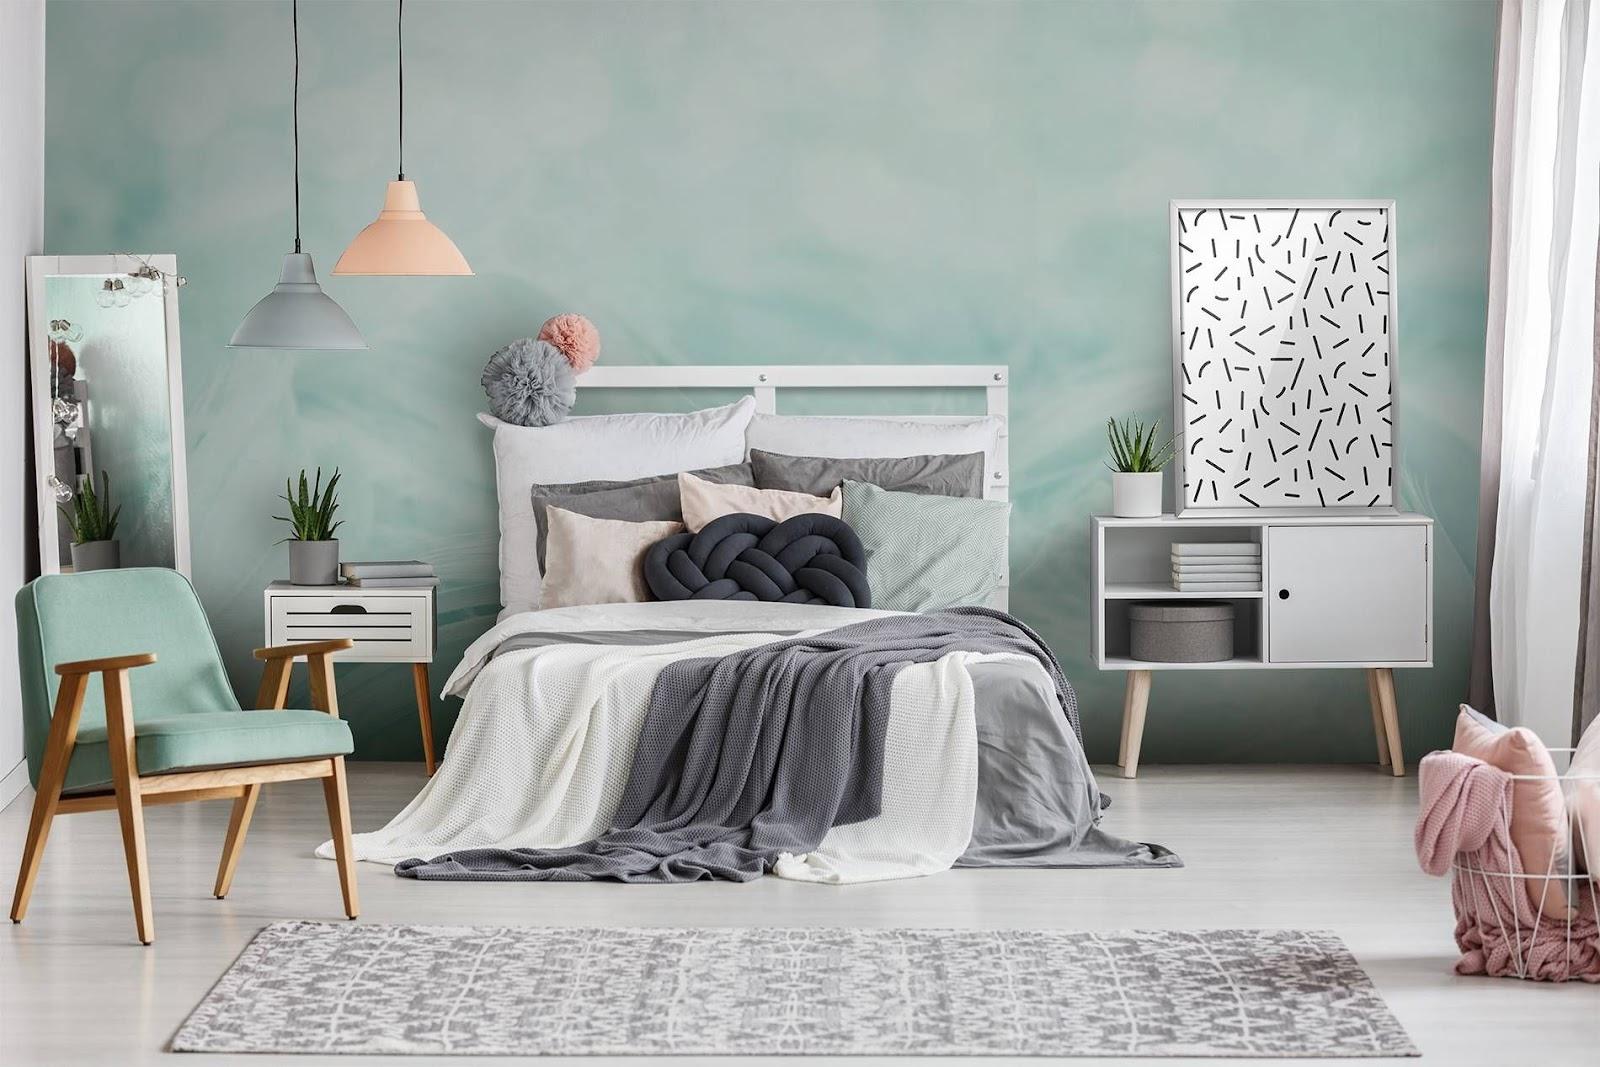 A Subtle Marble Backdrop for Bedroom